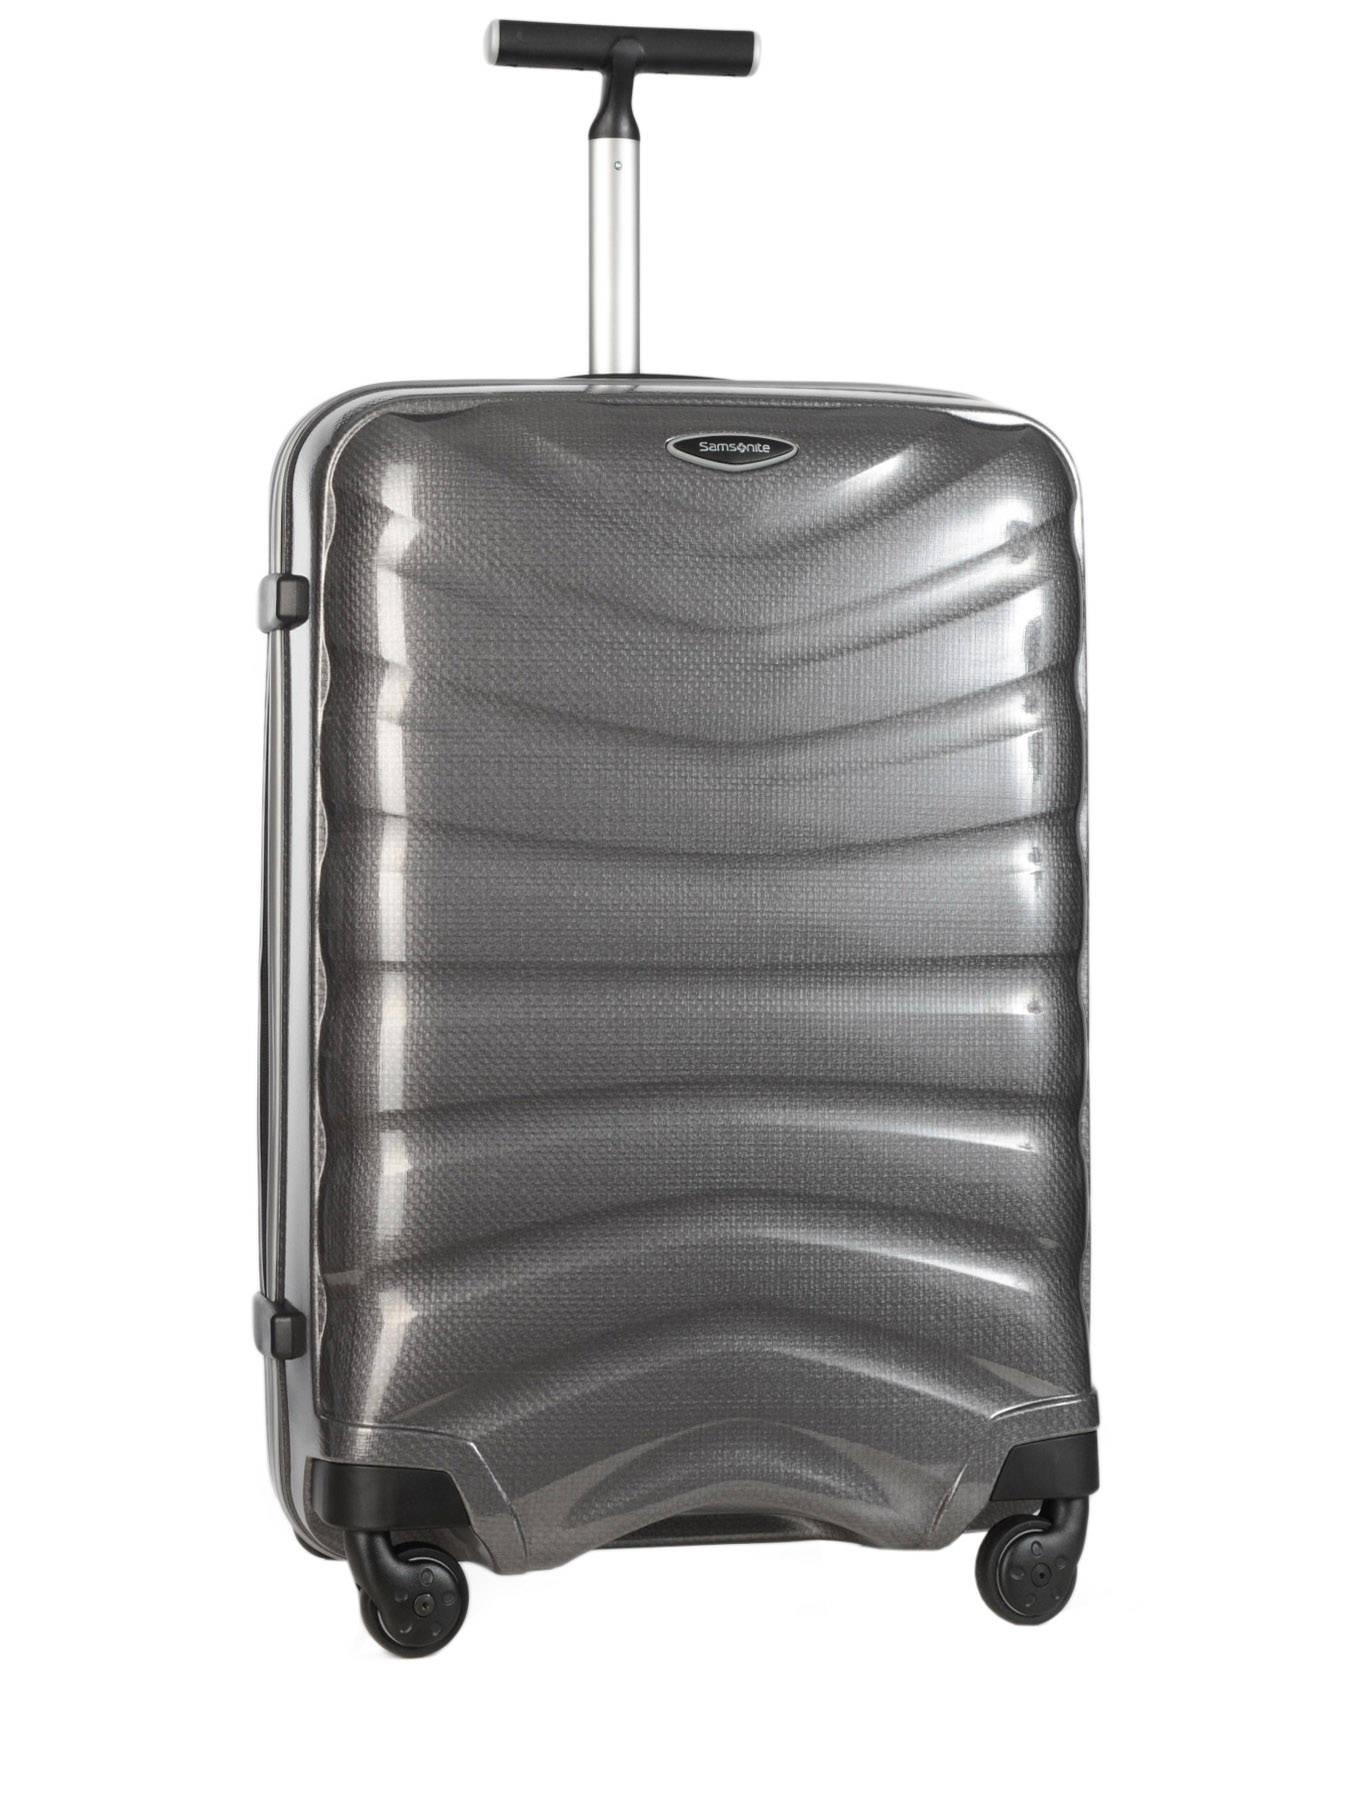 valise rigide samsonite firelite firelite en vente au. Black Bedroom Furniture Sets. Home Design Ideas